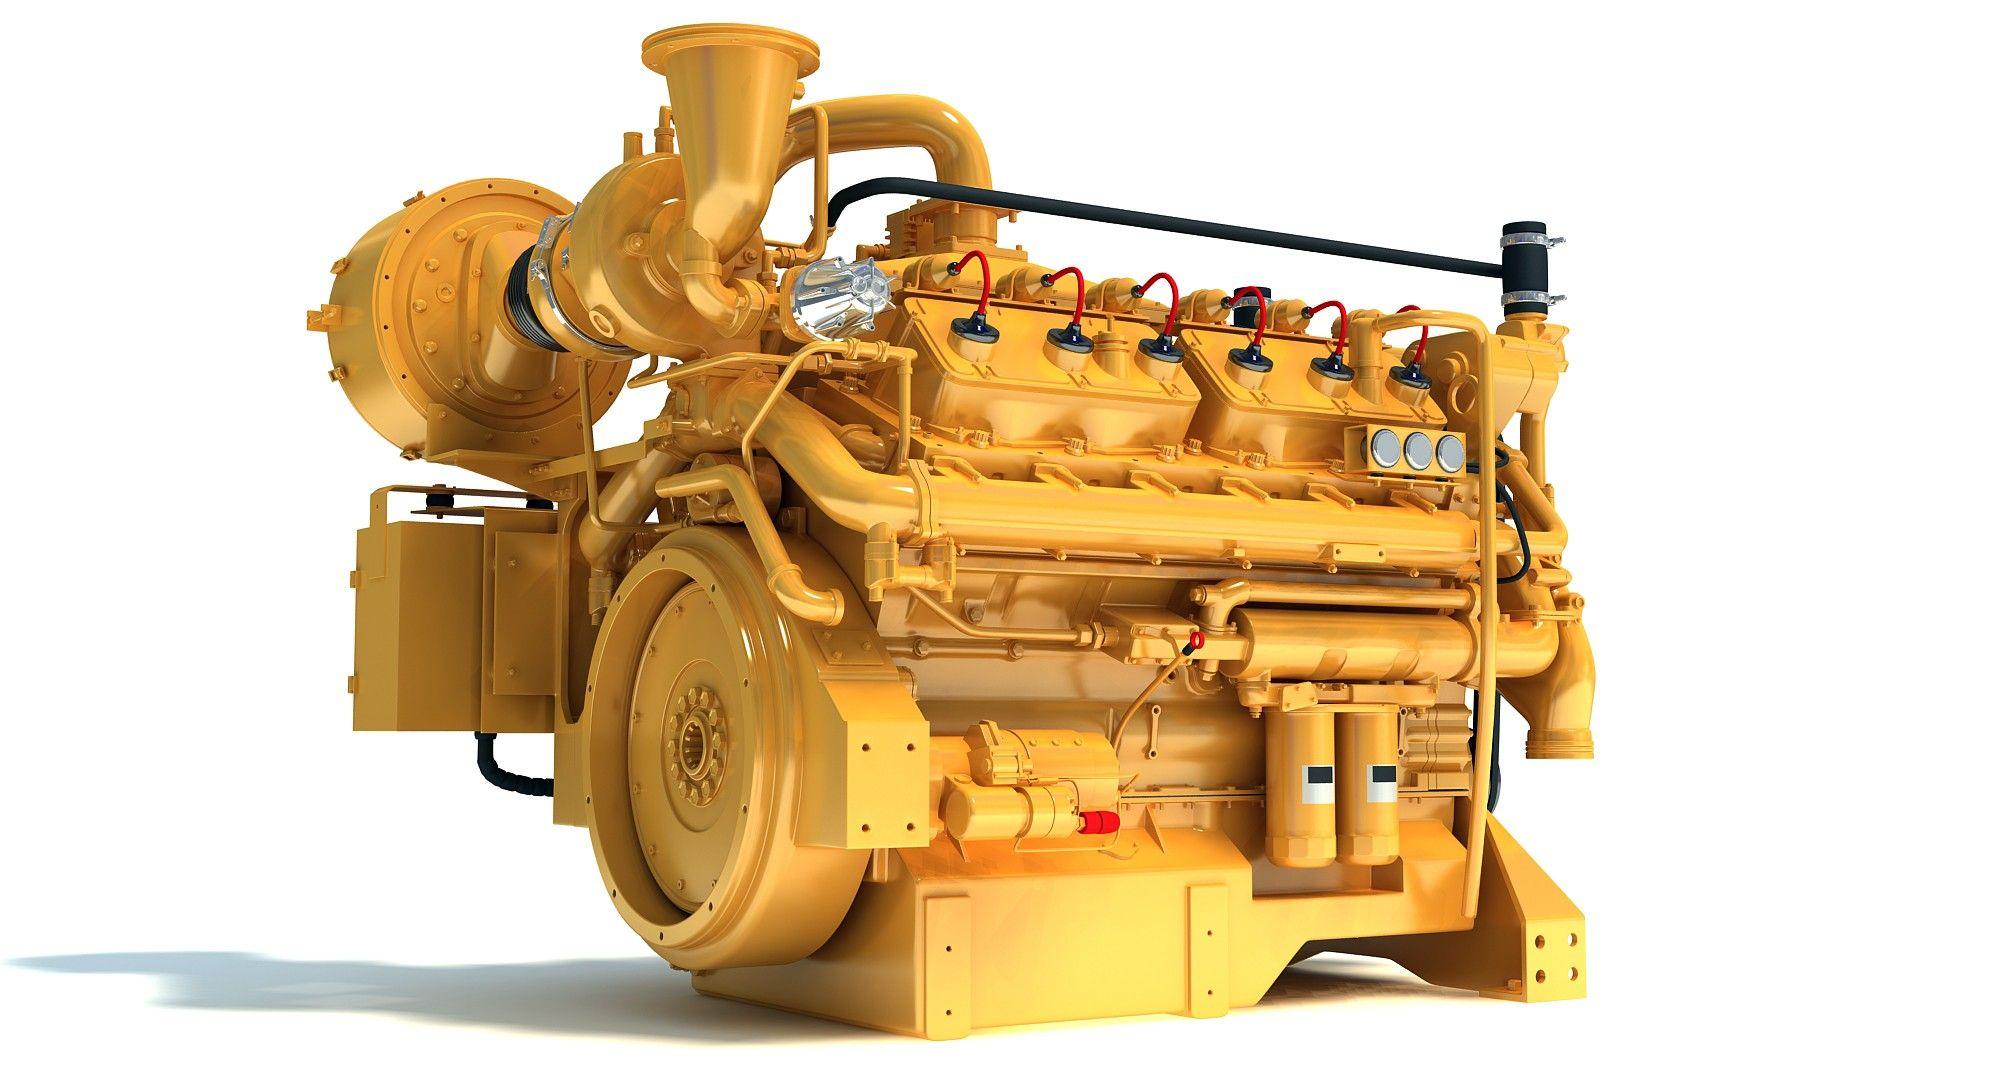 Caterpillar Cat Gas Generator 3d Model Gas Generator 3d Model Gas